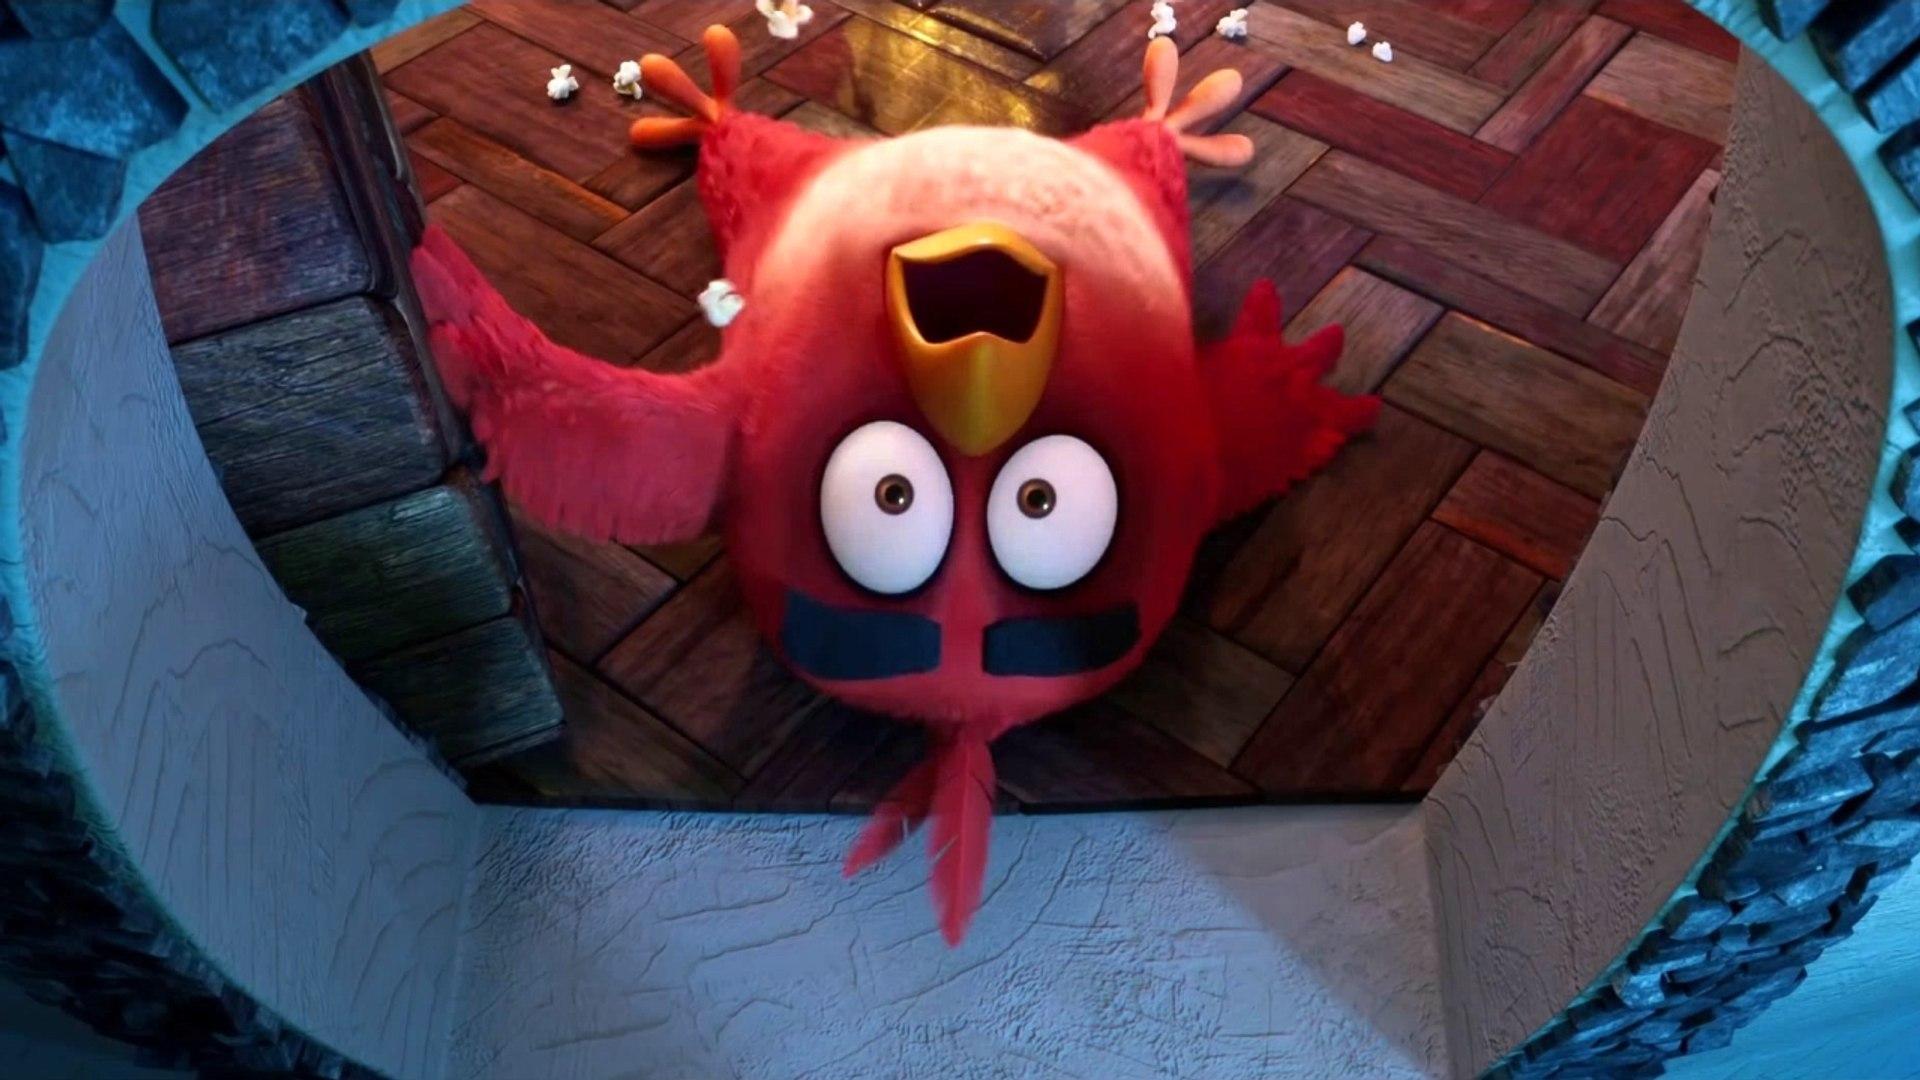 The Angry Birds Movie 2: Sneak Peek